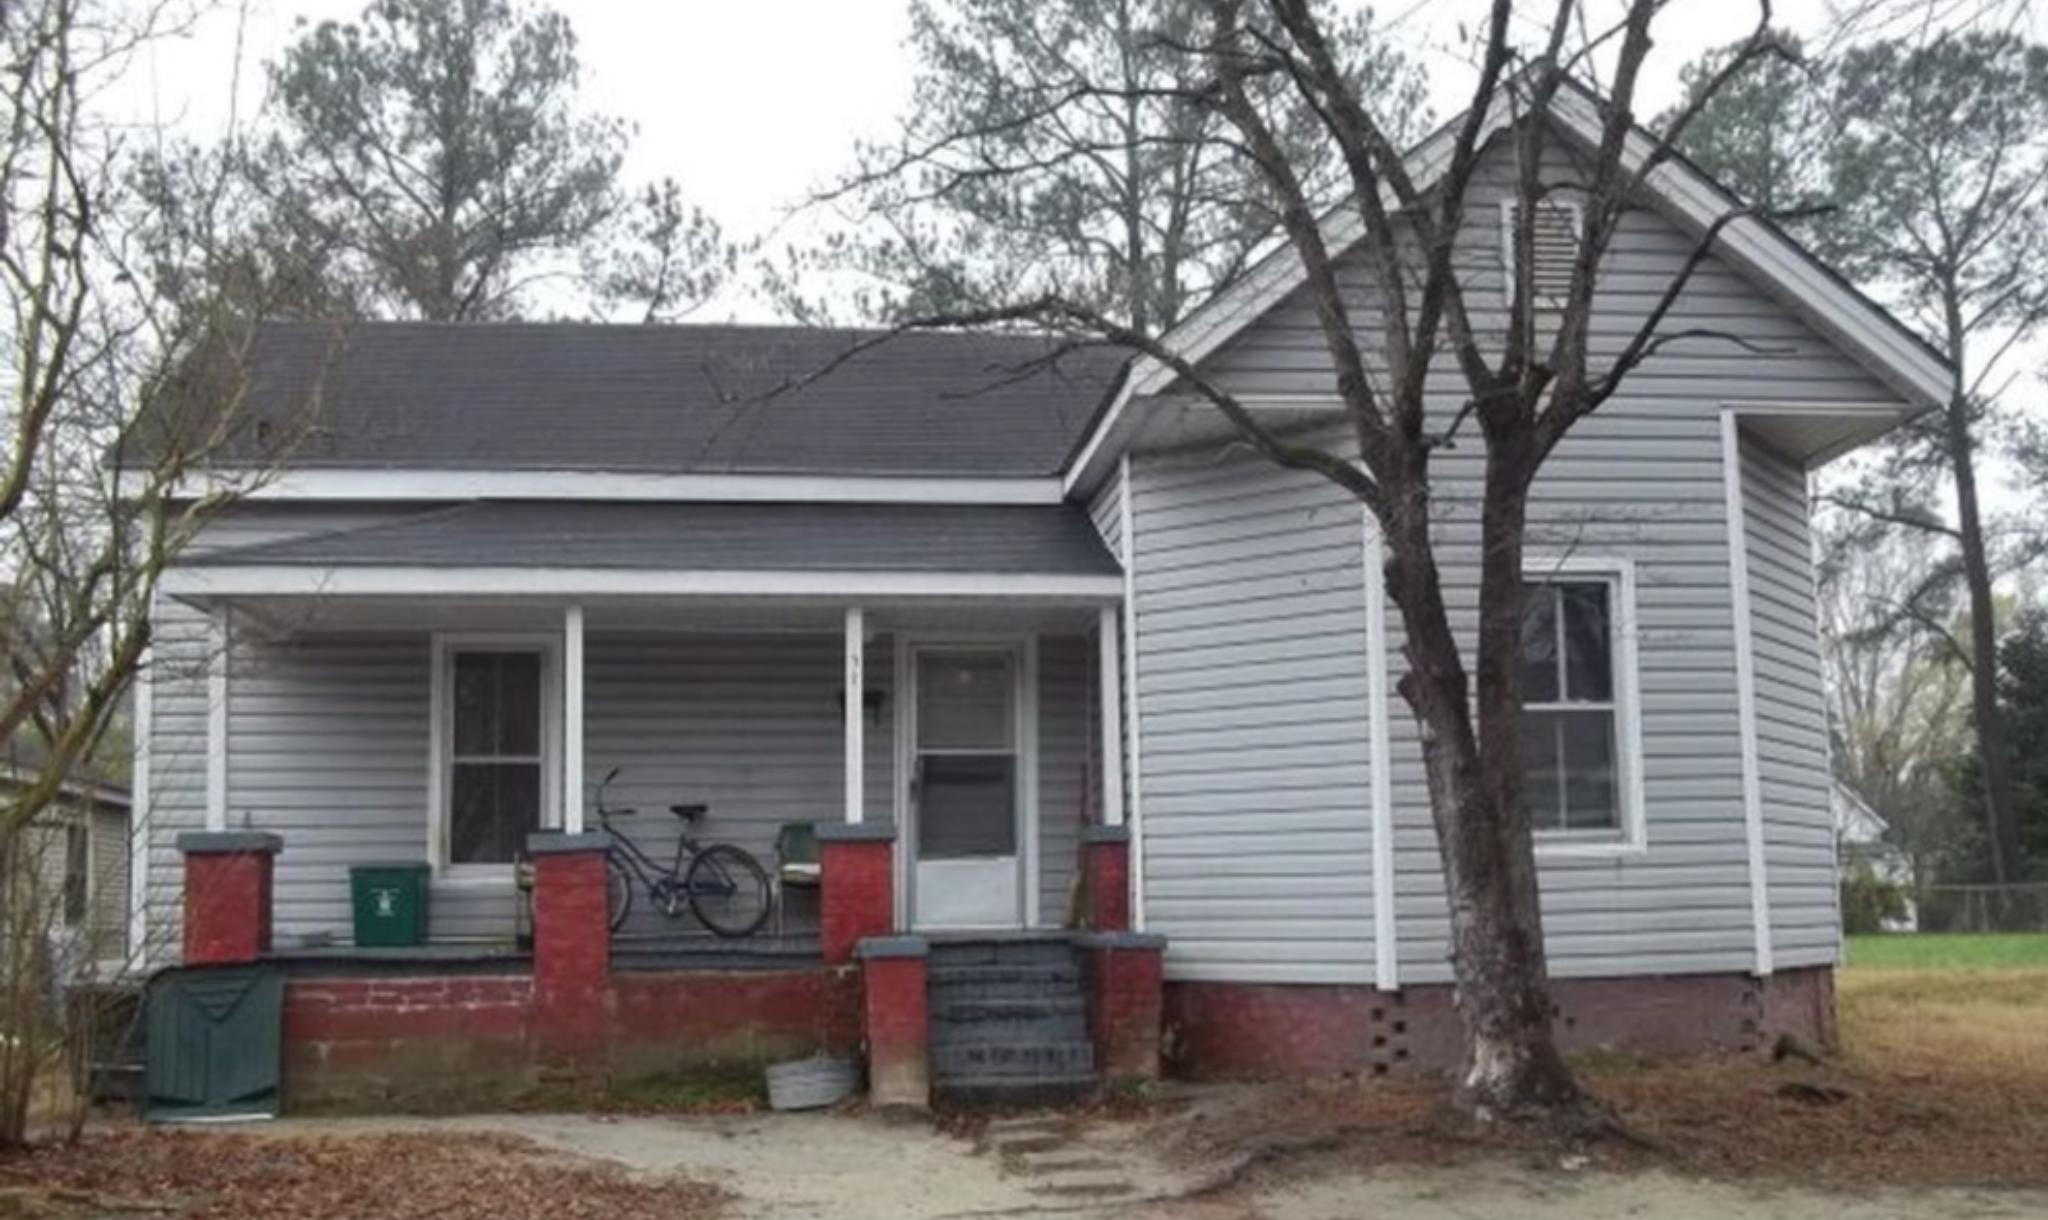 529 Dexter St, Rocky Mount, NC